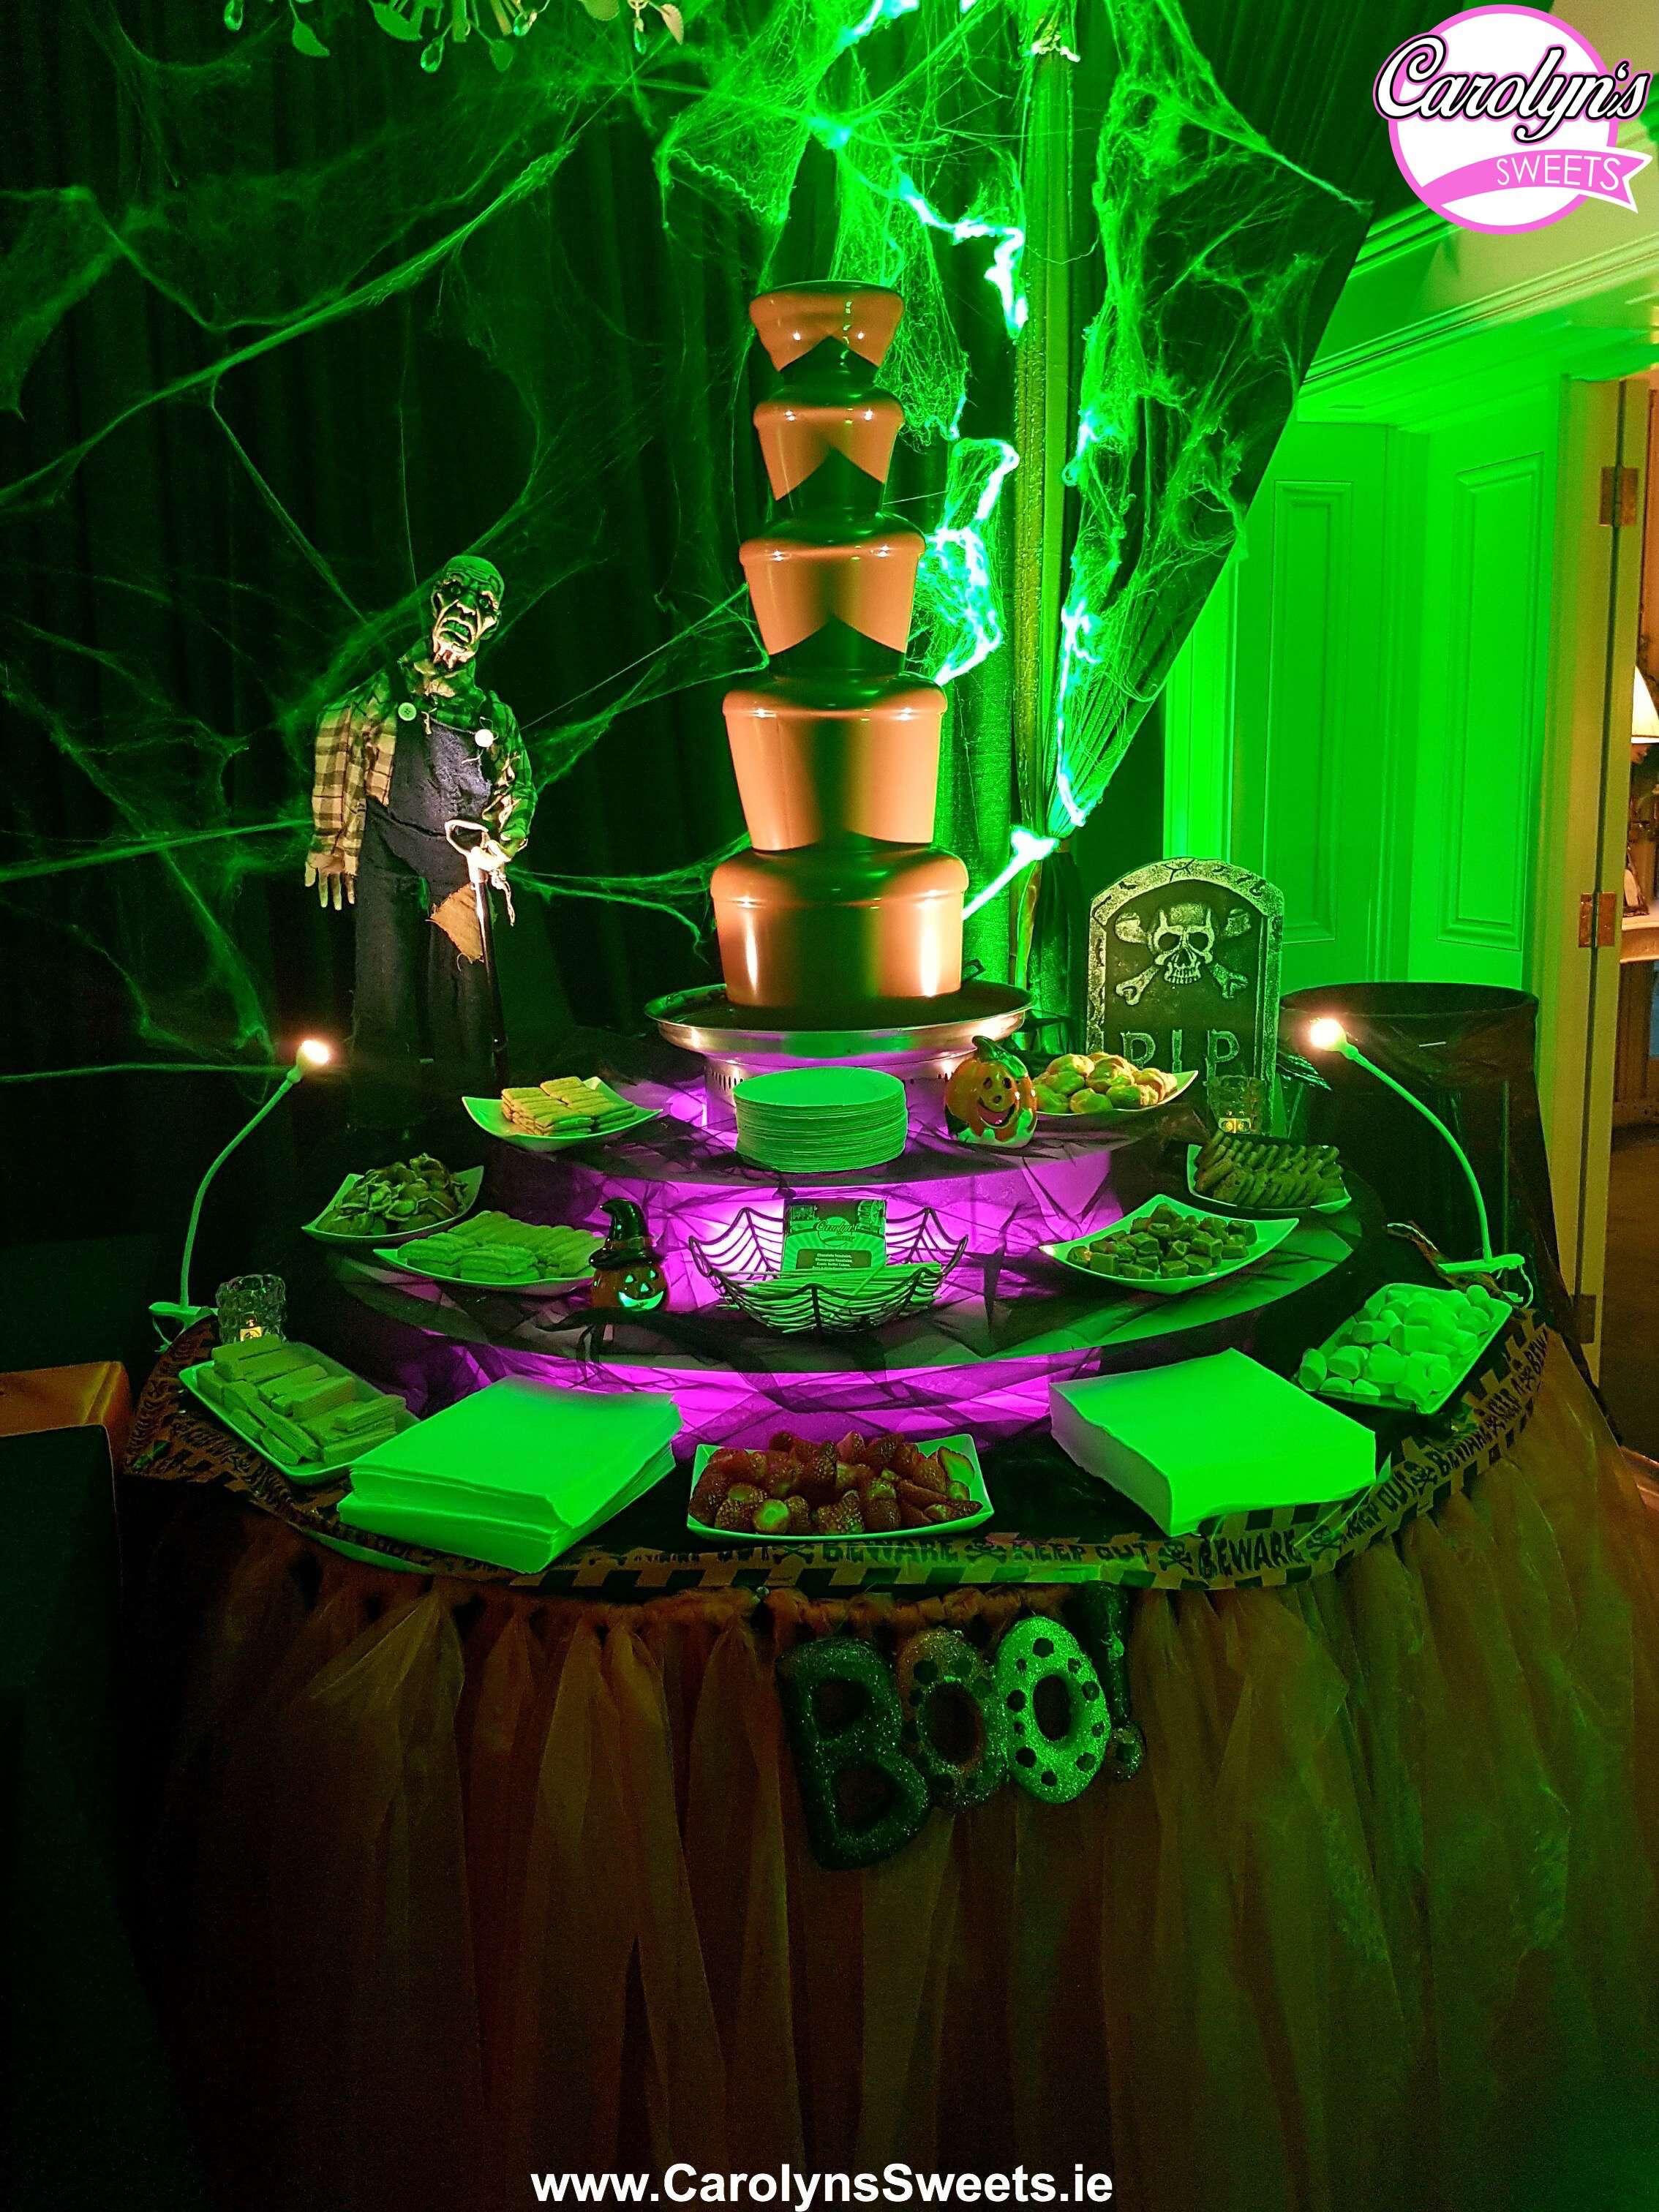 Chocolate Fountain Hire4 2